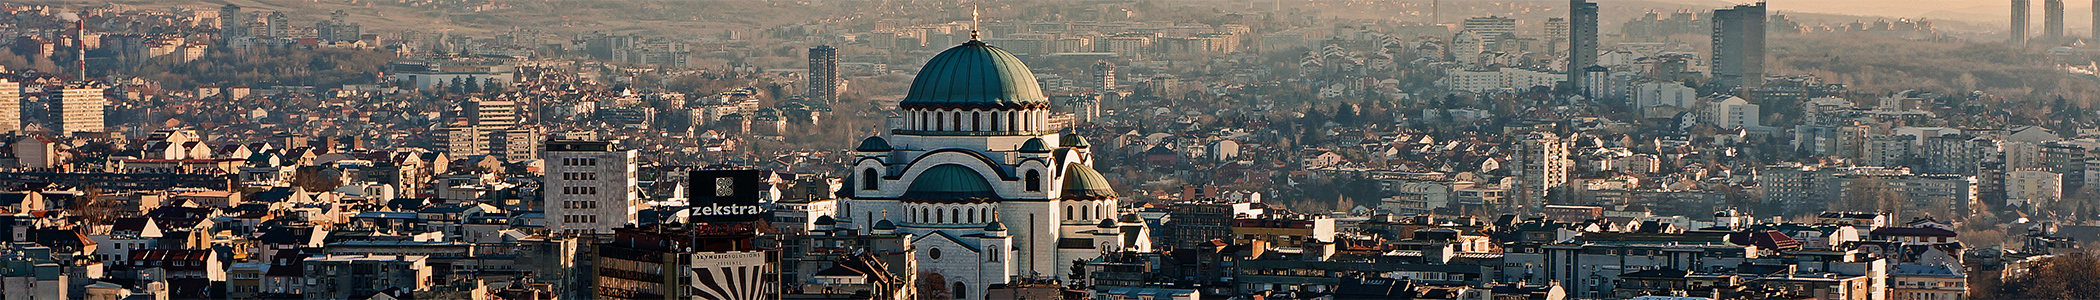 - Belgrade panorama banner1 - How To Find Good Office Space in Belgrade? (Location)